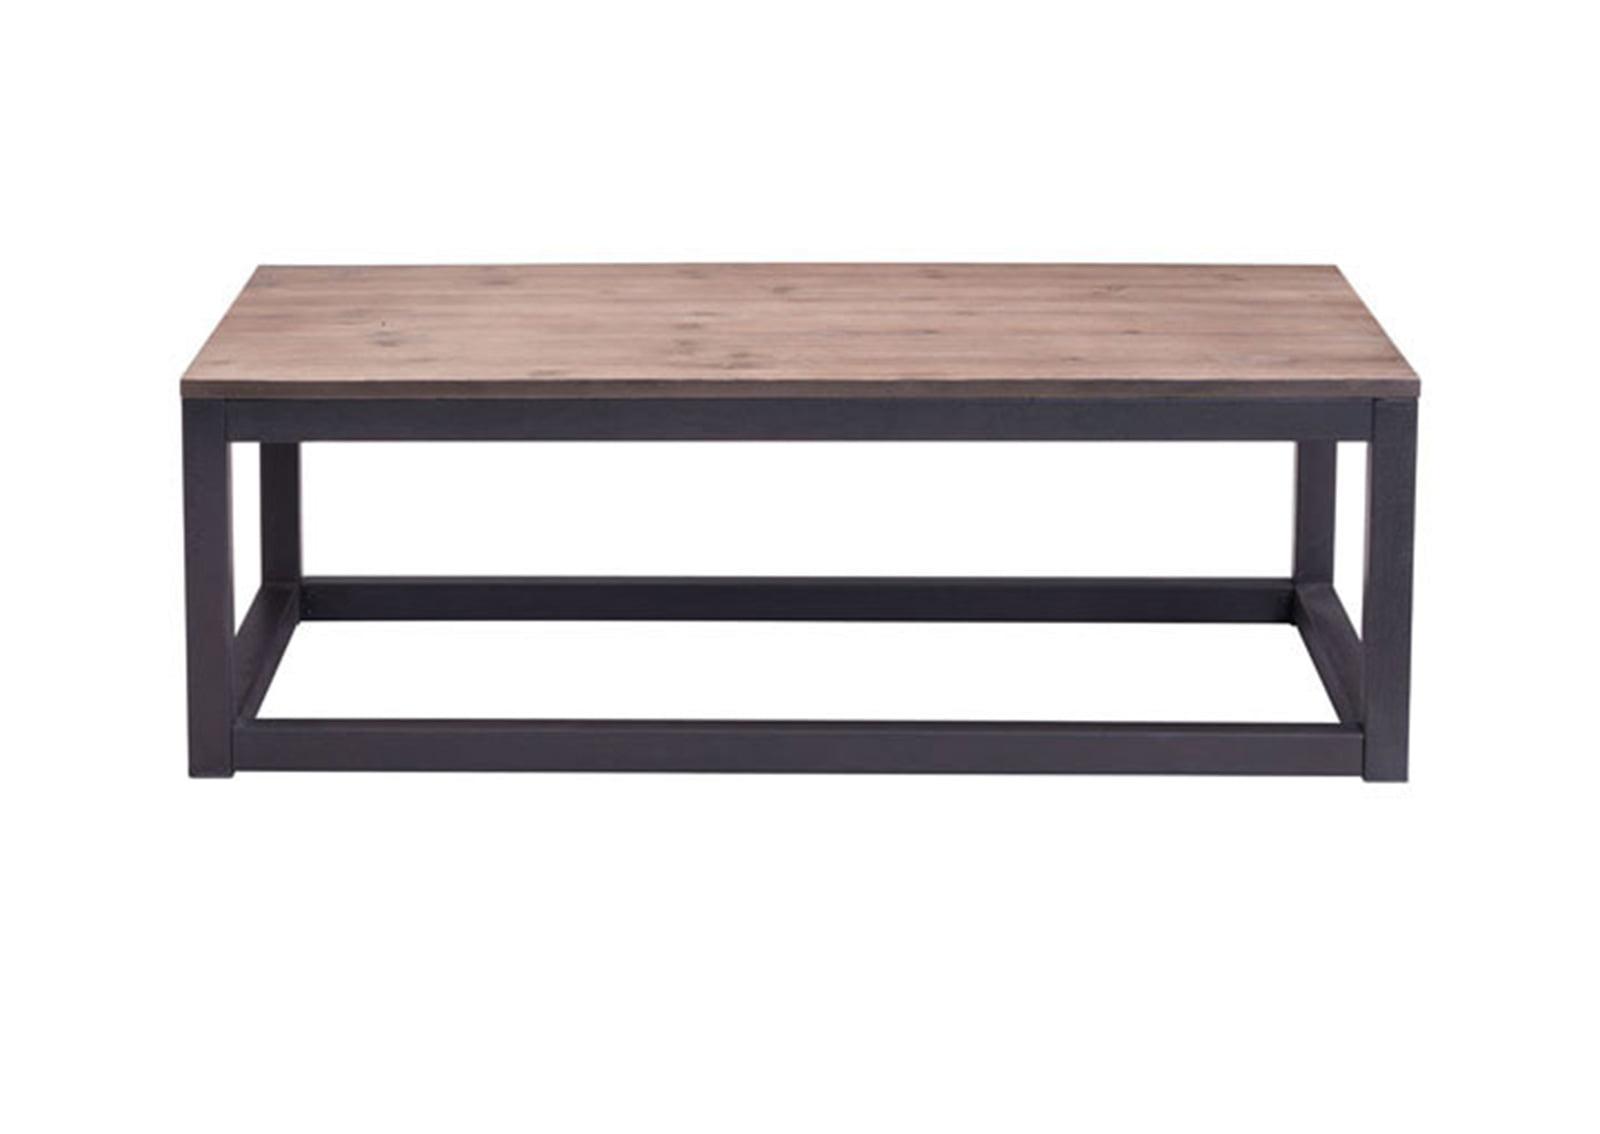 Civic Rectangular Coffee Table Distressed Natural Furnishplus